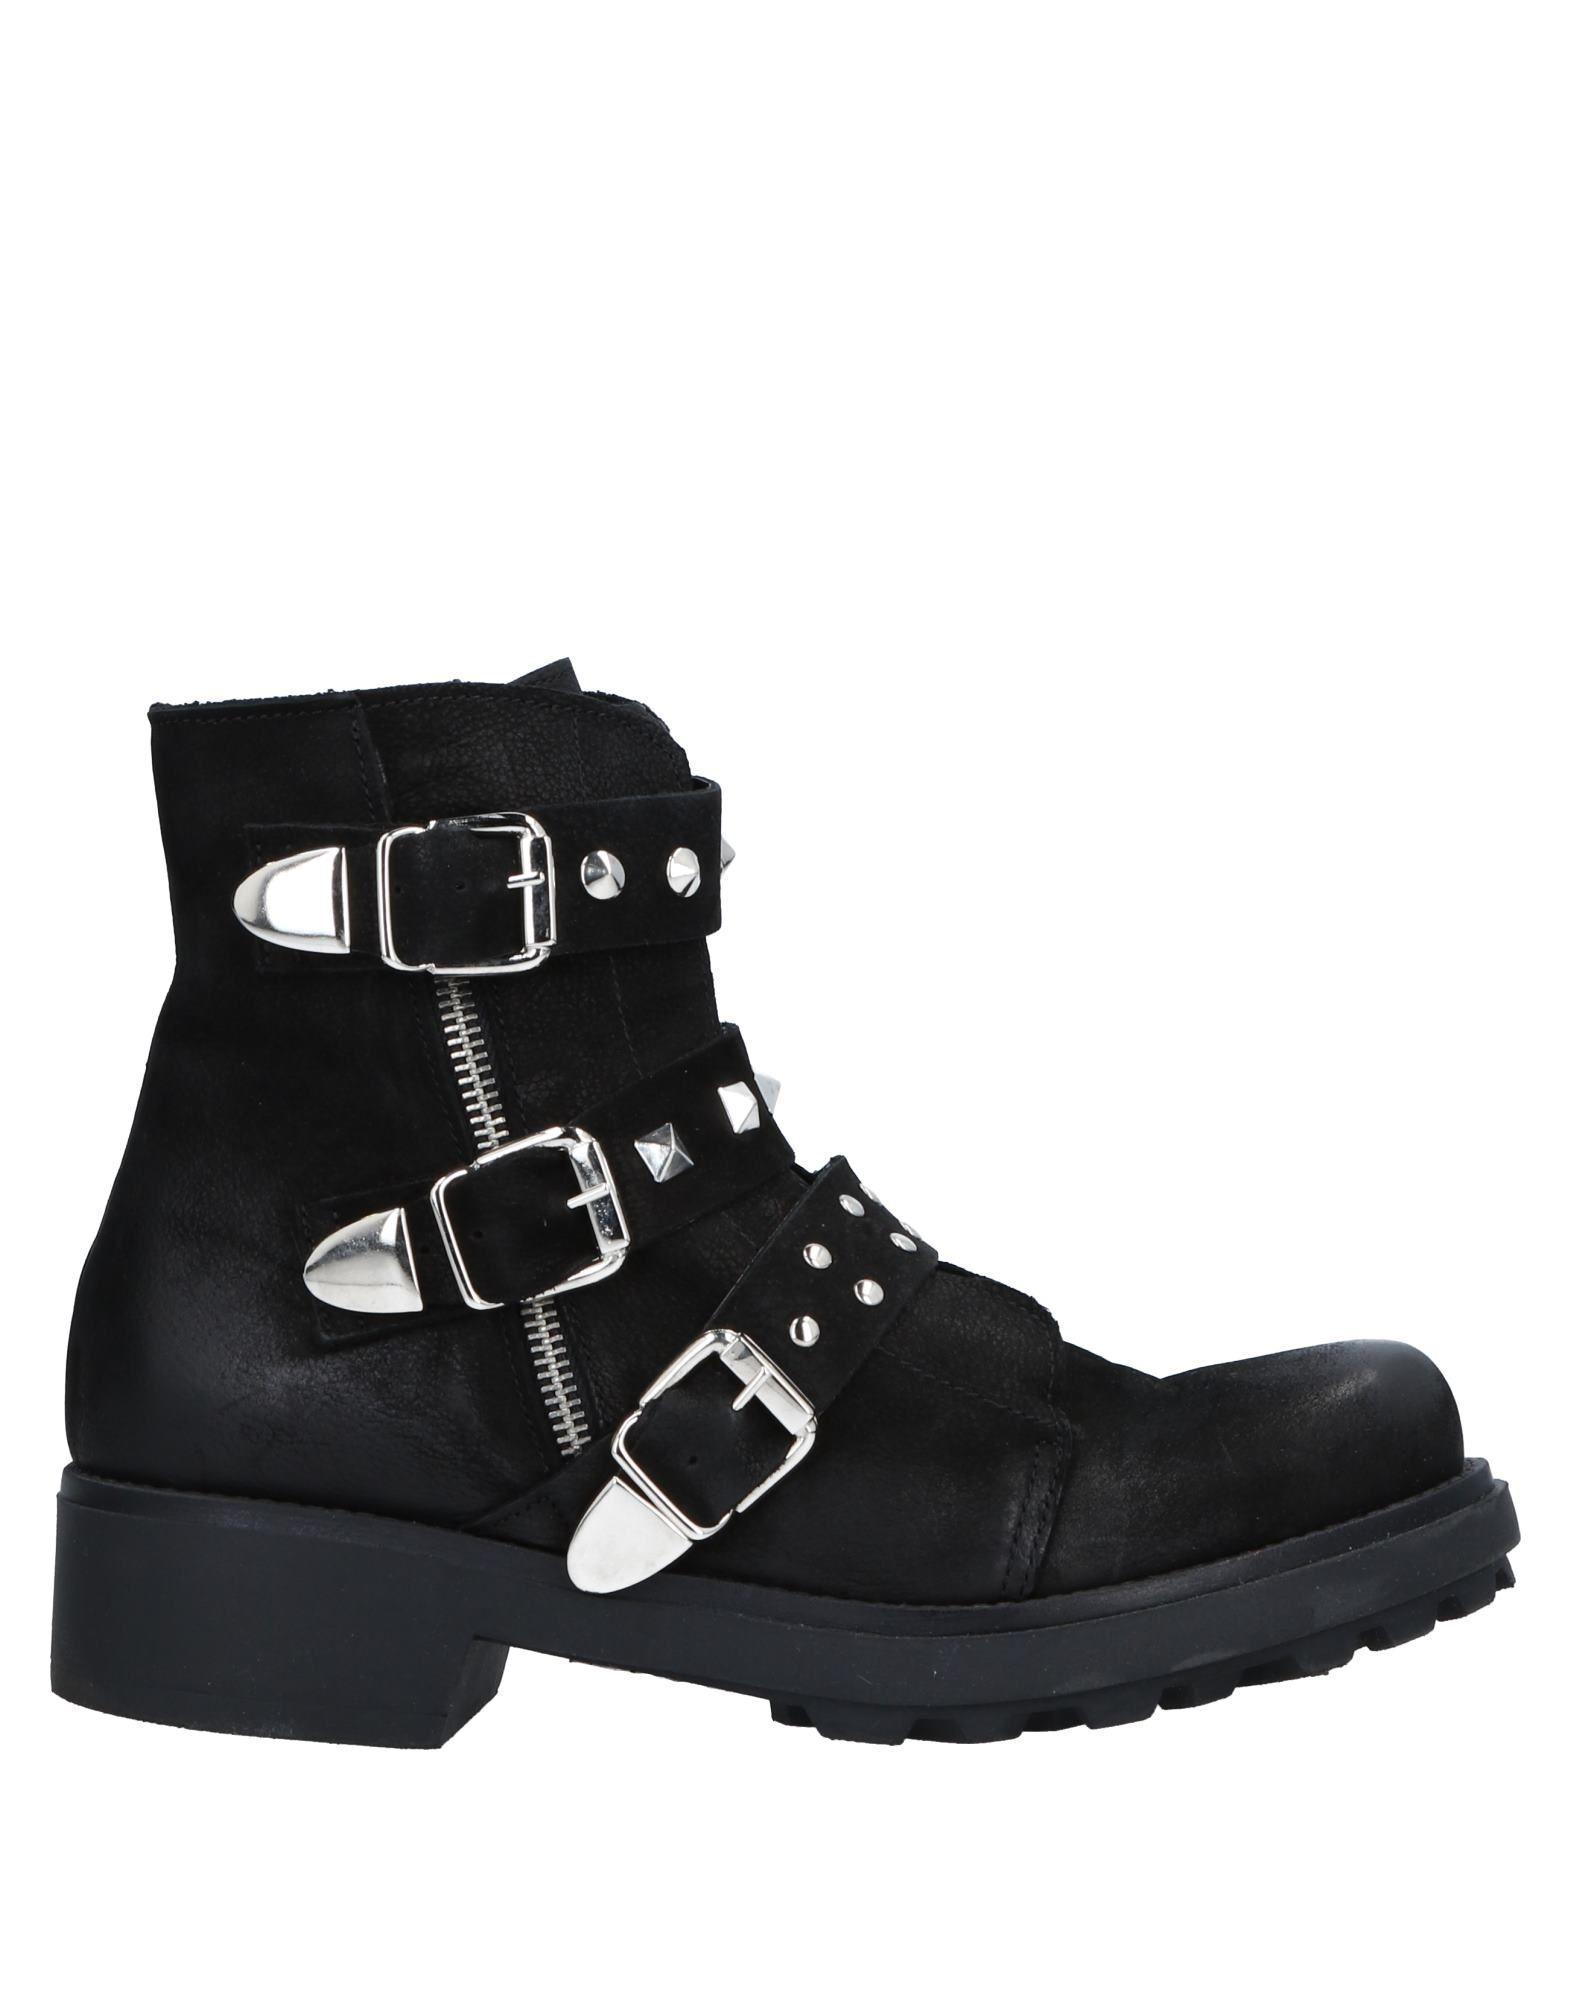 Rabatt Schuhe Onako' Stiefelette Damen  11526189XB